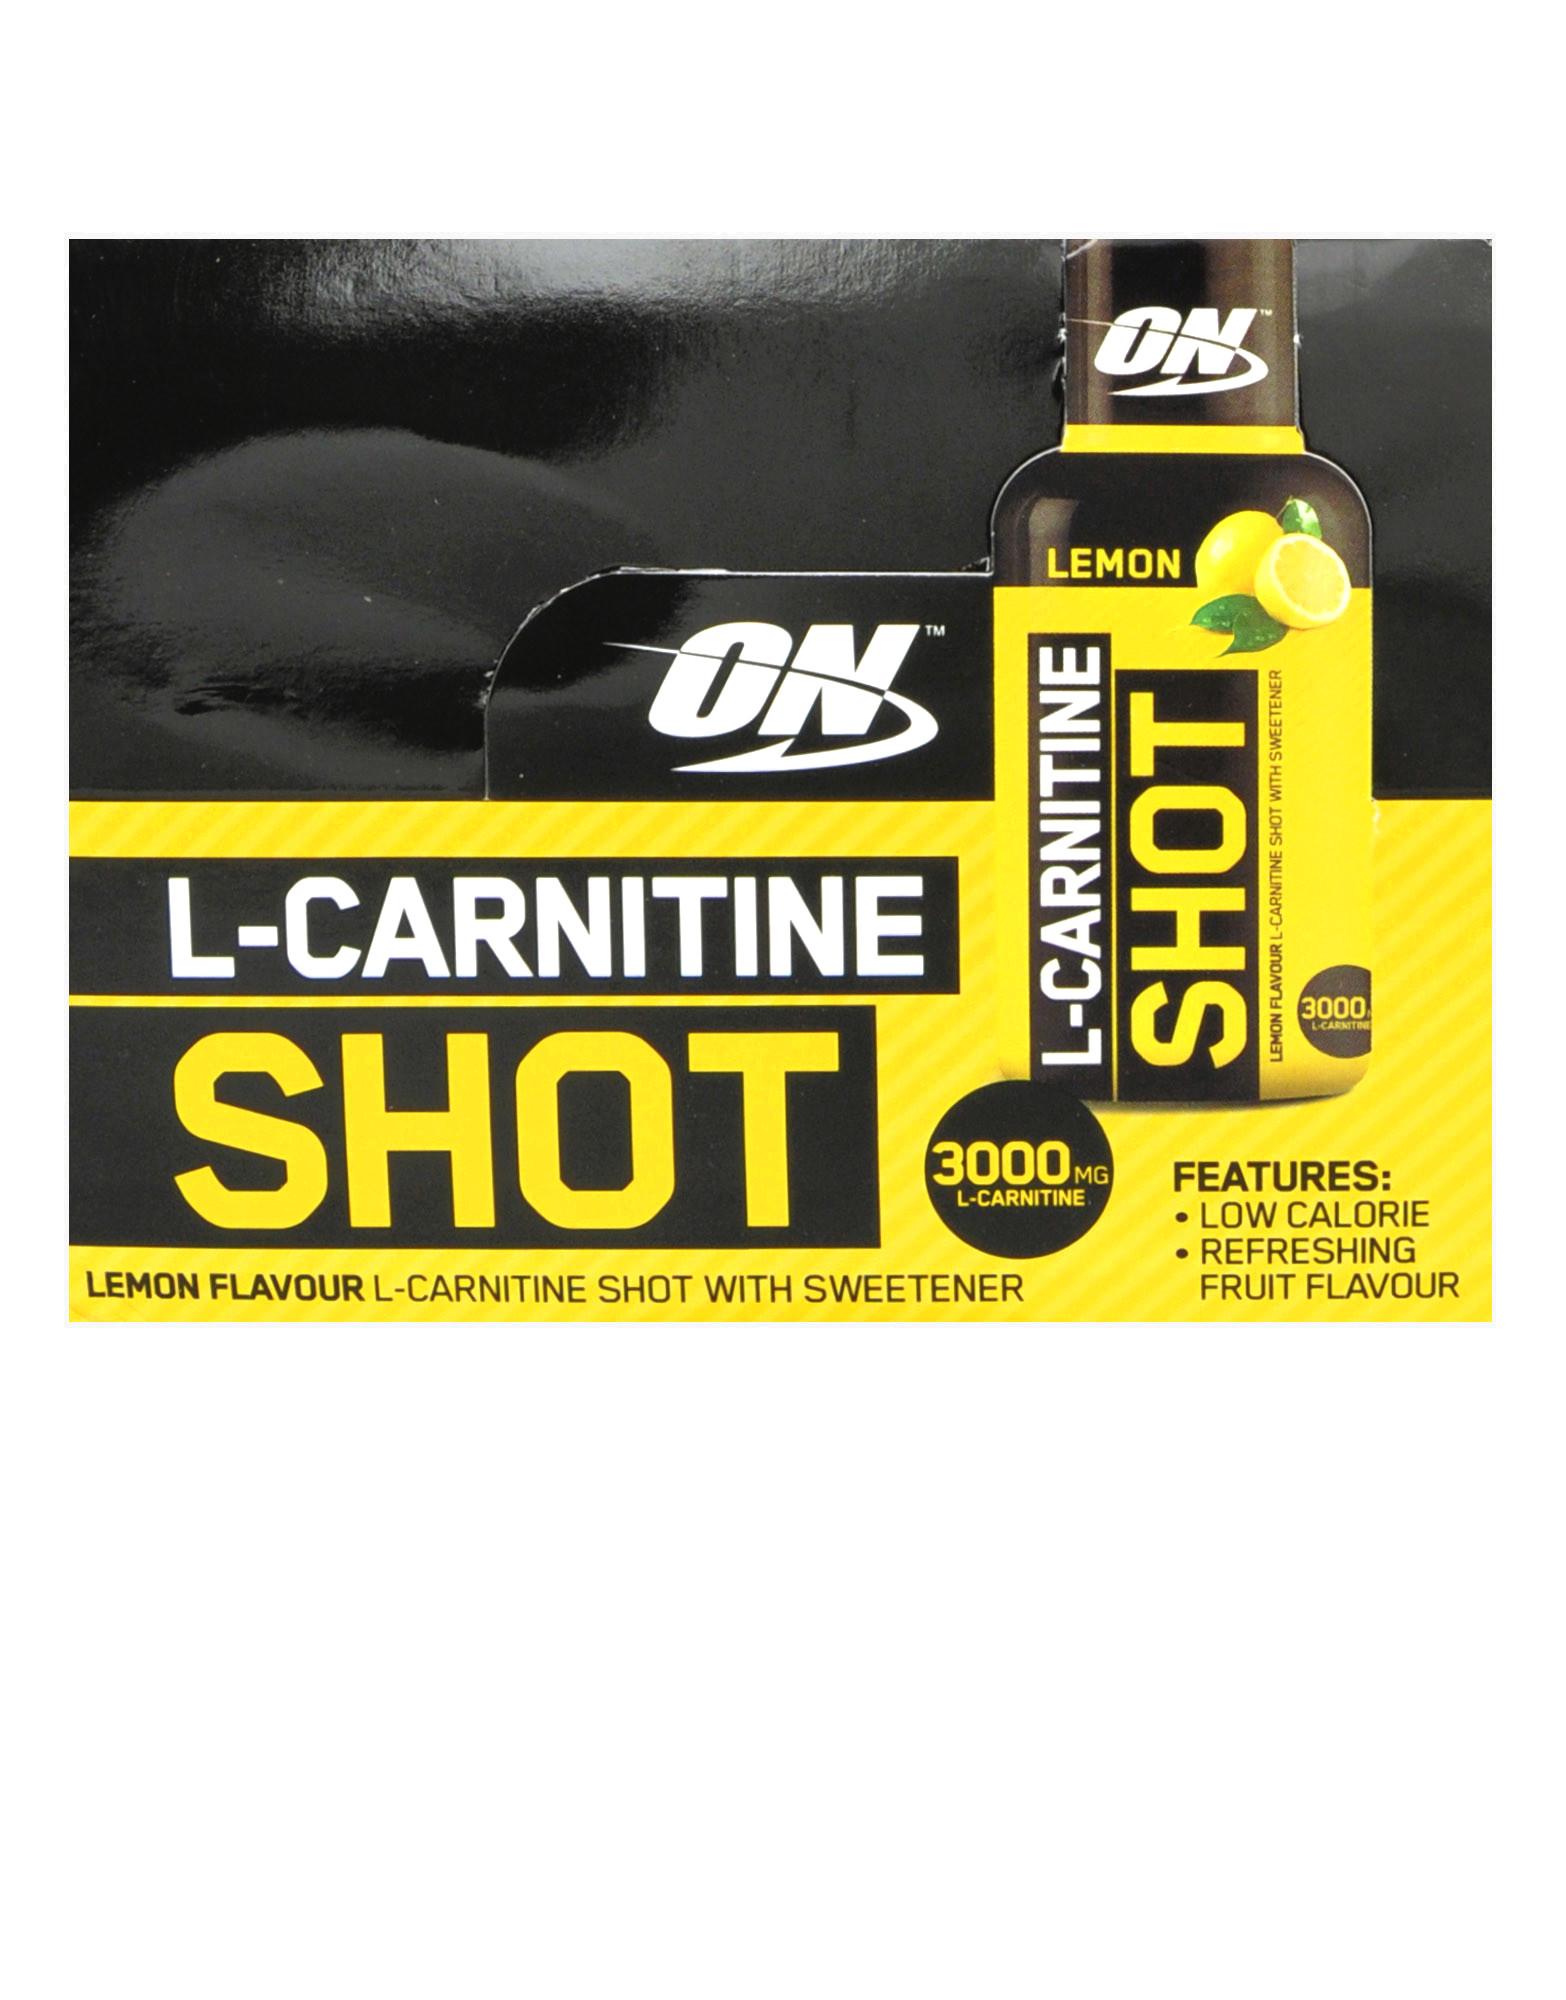 L-Carnitine Shot by Optimum nutrition